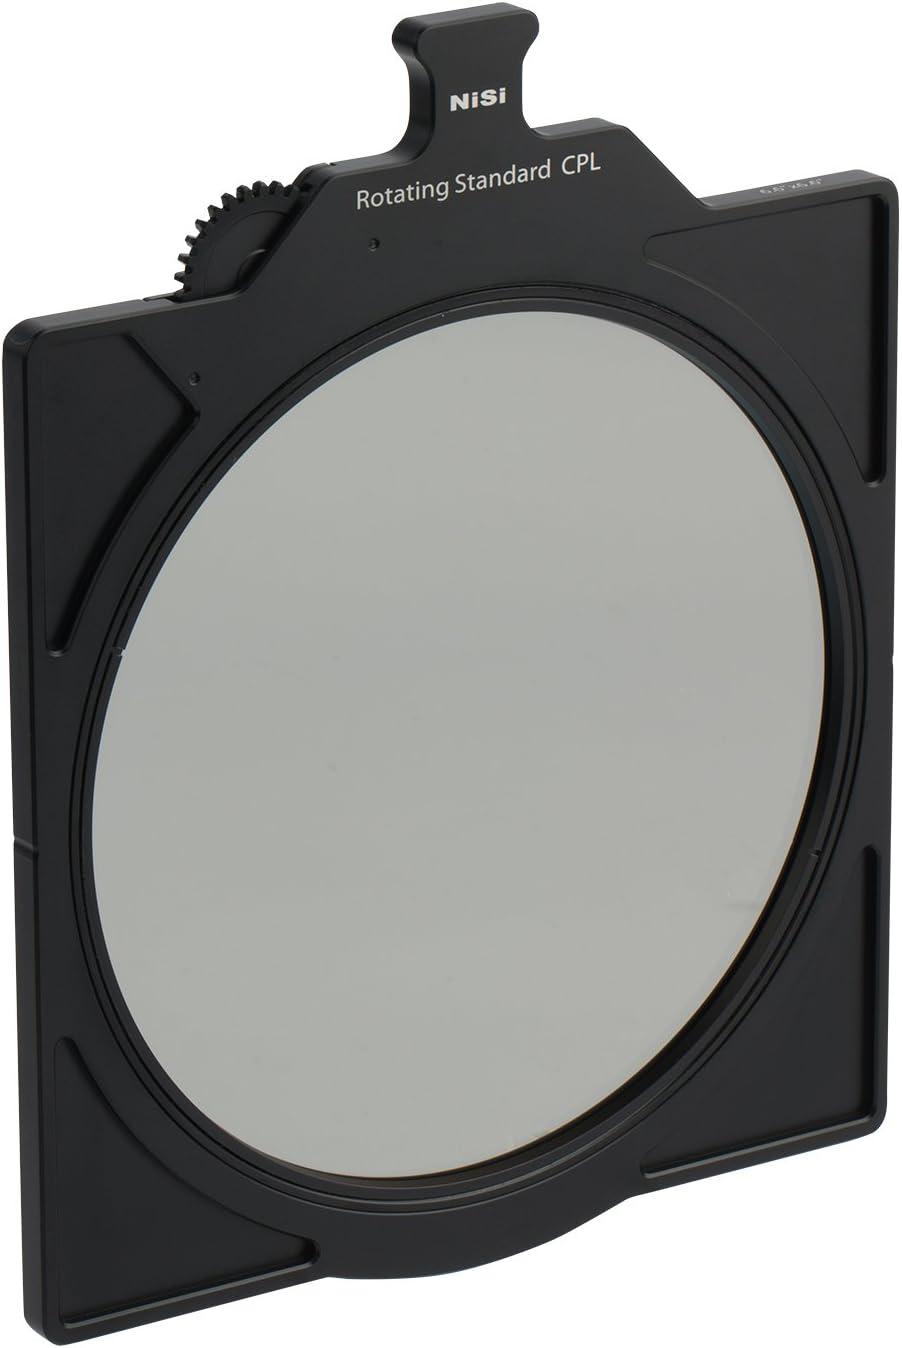 NiSi NIC-66-CPL Rotating Circular Polarizer for 6.6x6.6 Matte Box Black